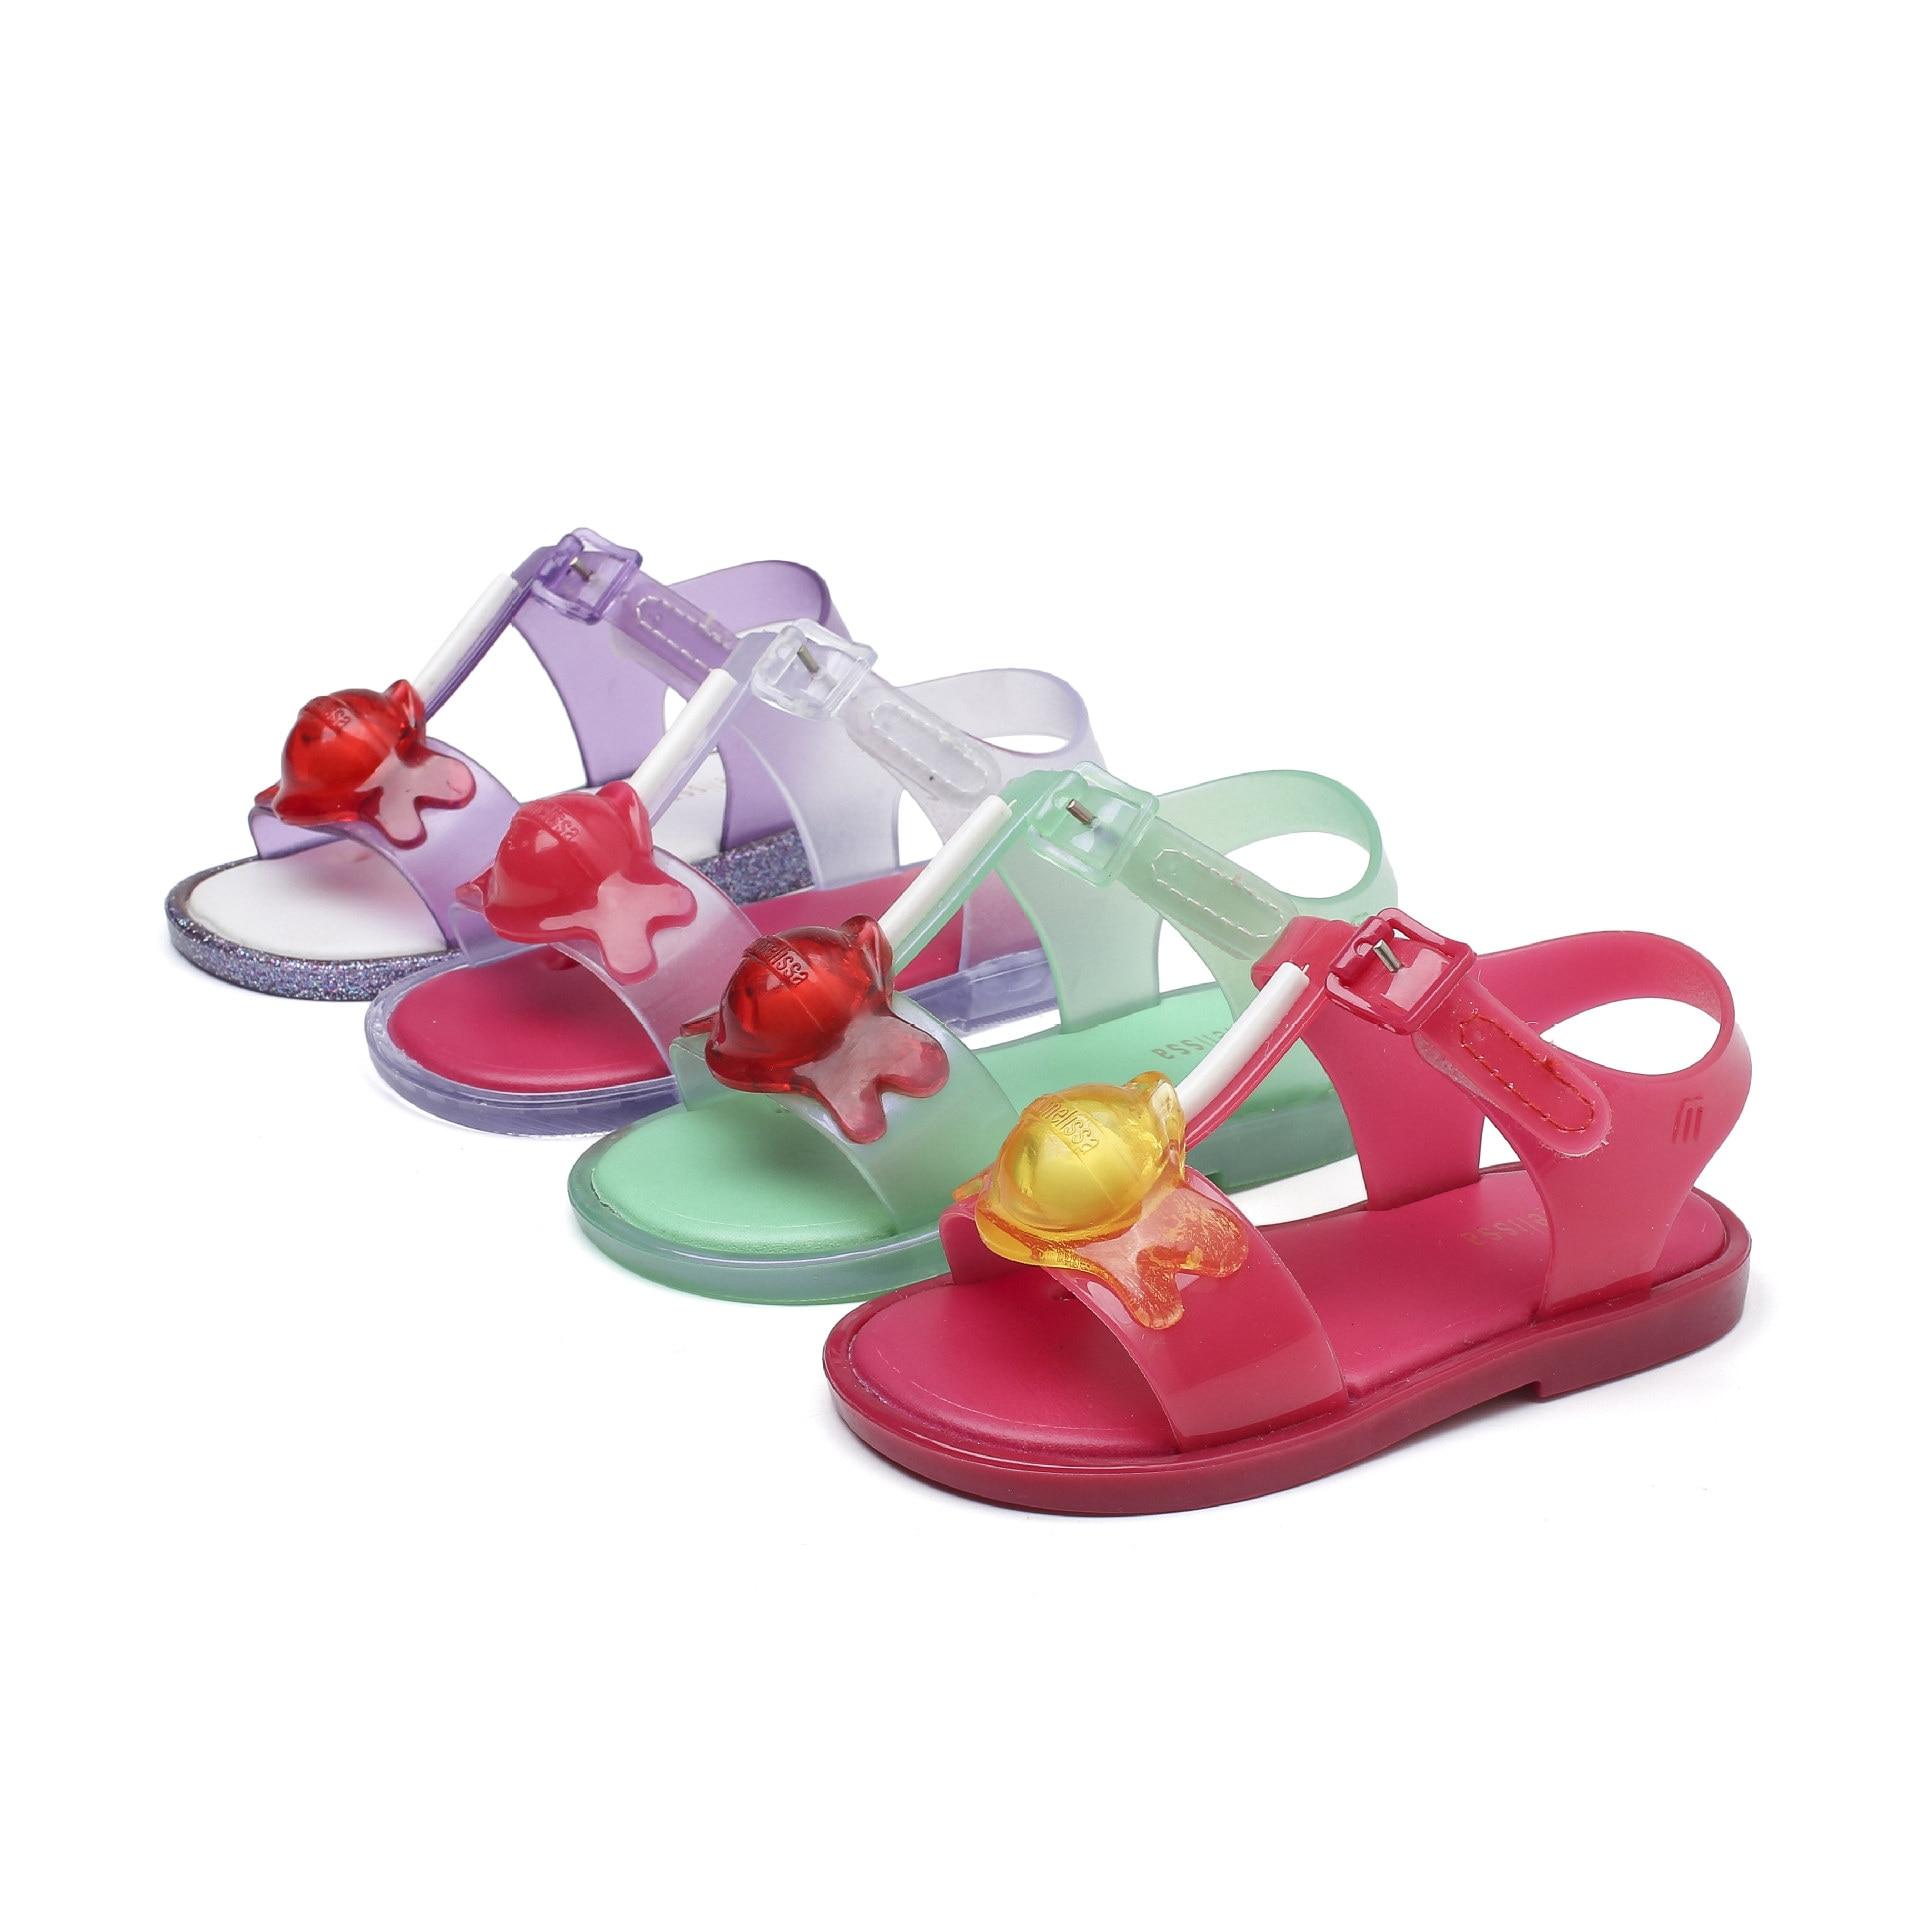 Mini Melissa Lollipop Girl Sandals 2019 New Original Jelly Kids Children Beach Shoes Non-slip Toddler